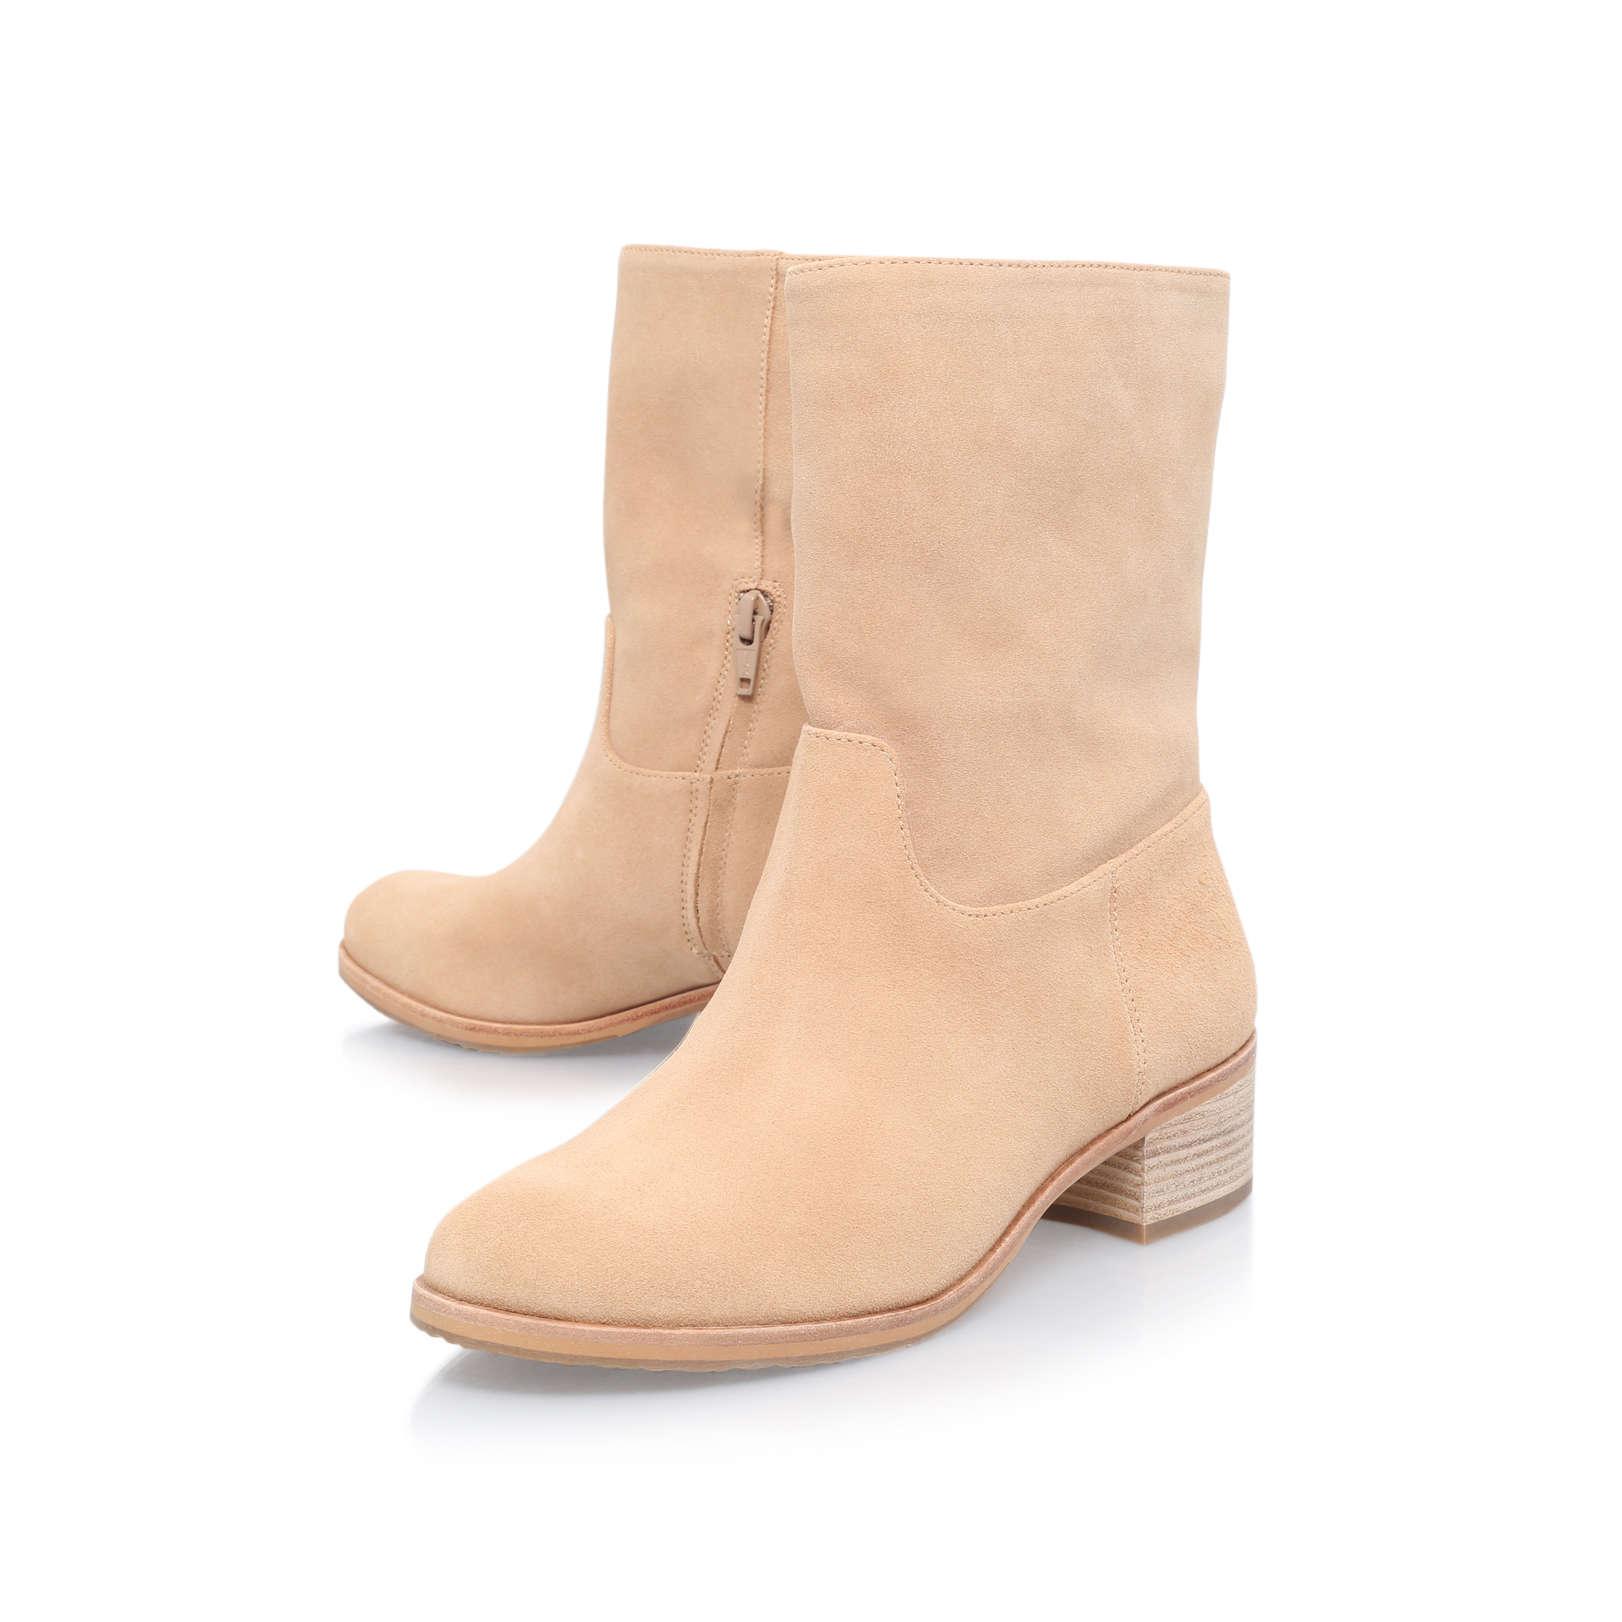 pierce ankle boot michael michael kors pierce ankle boot beige suede ankle boots by michael. Black Bedroom Furniture Sets. Home Design Ideas